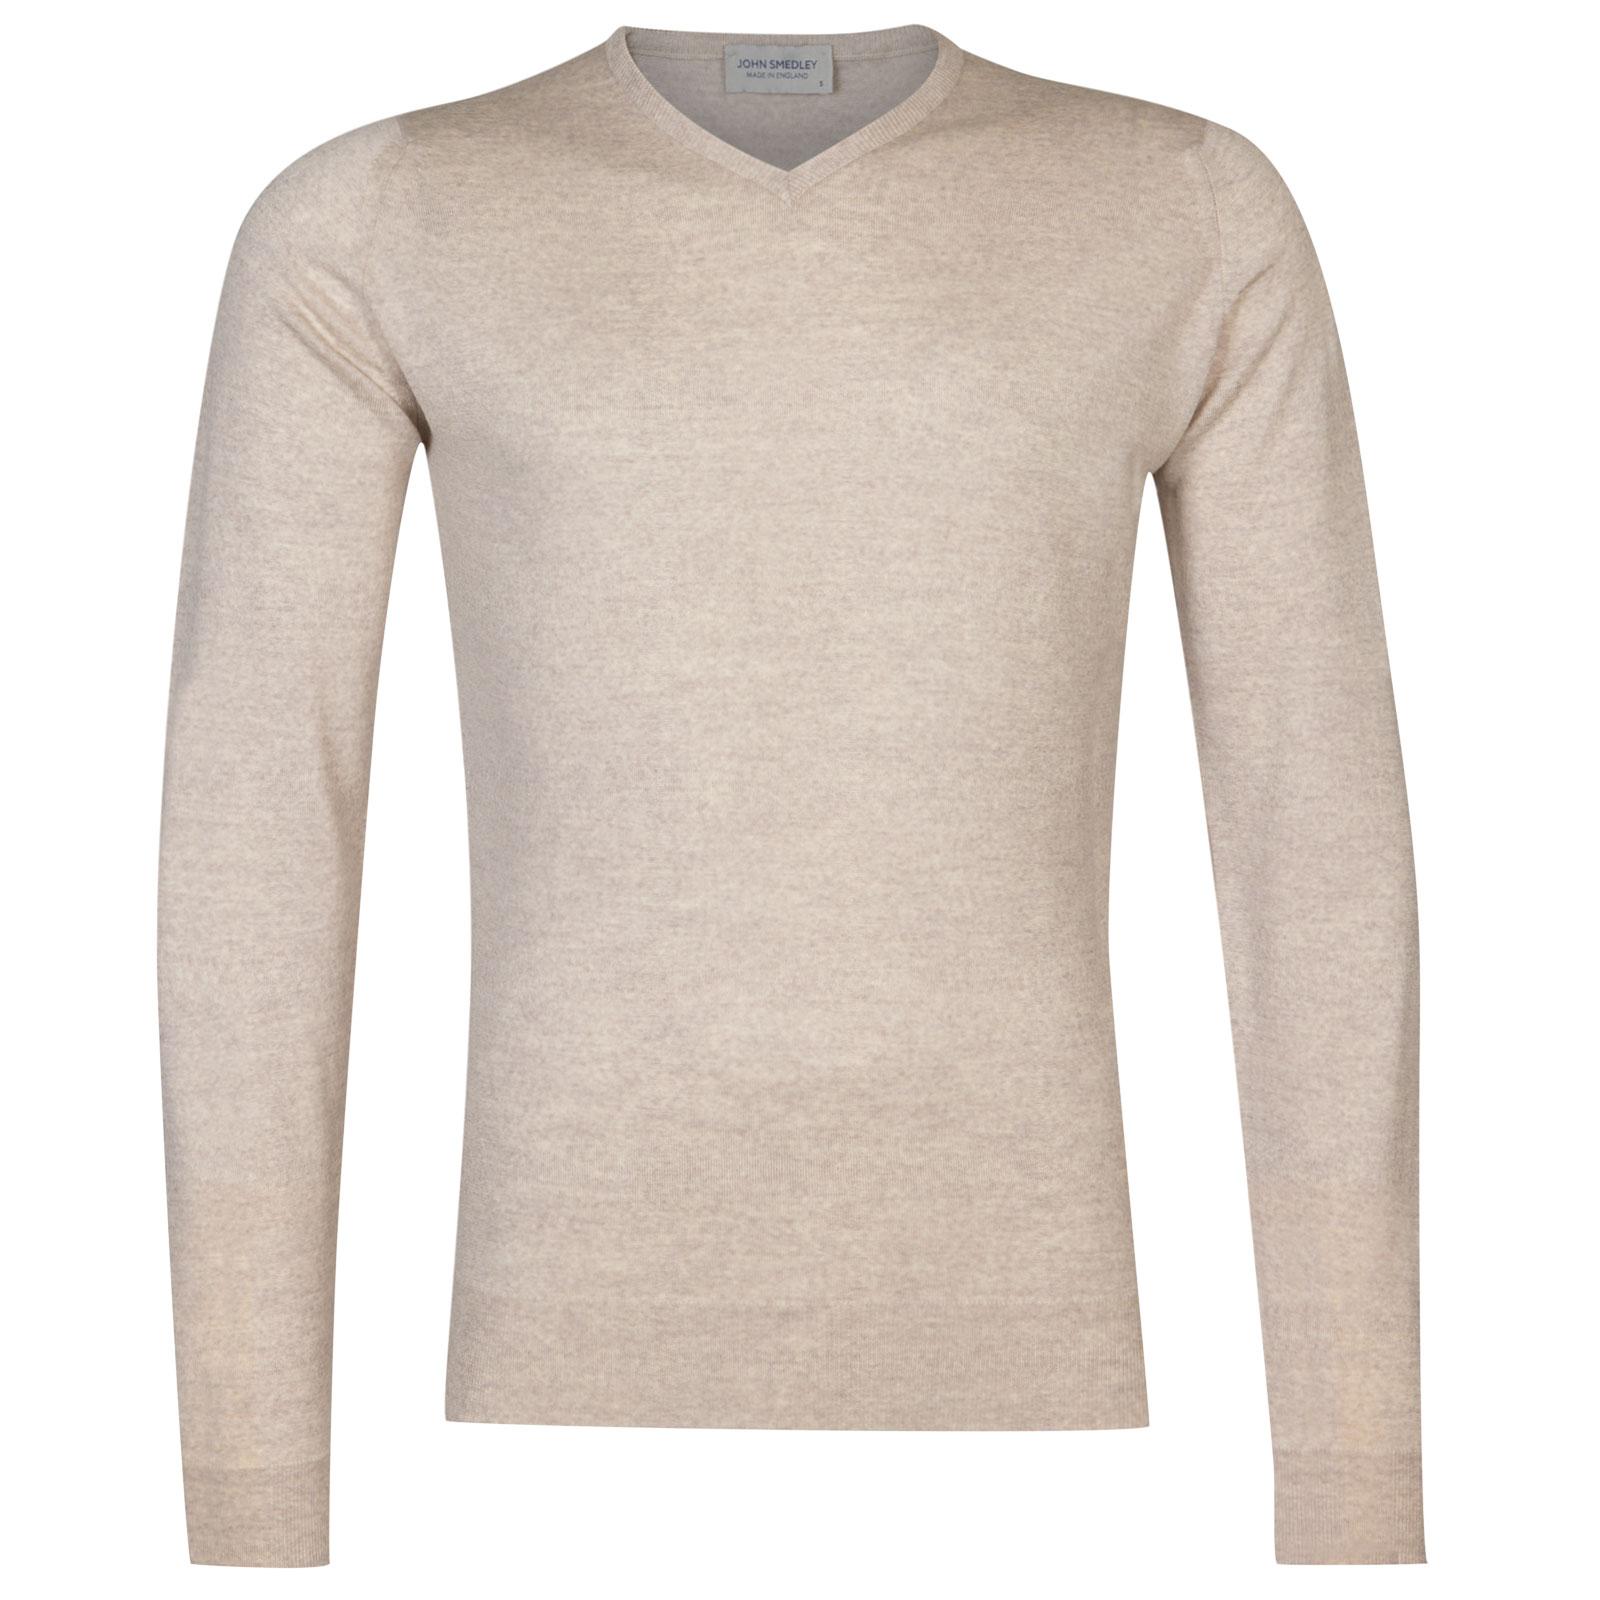 John Smedley Shipton Merino Wool Pullover in Eastwood Beige-XL